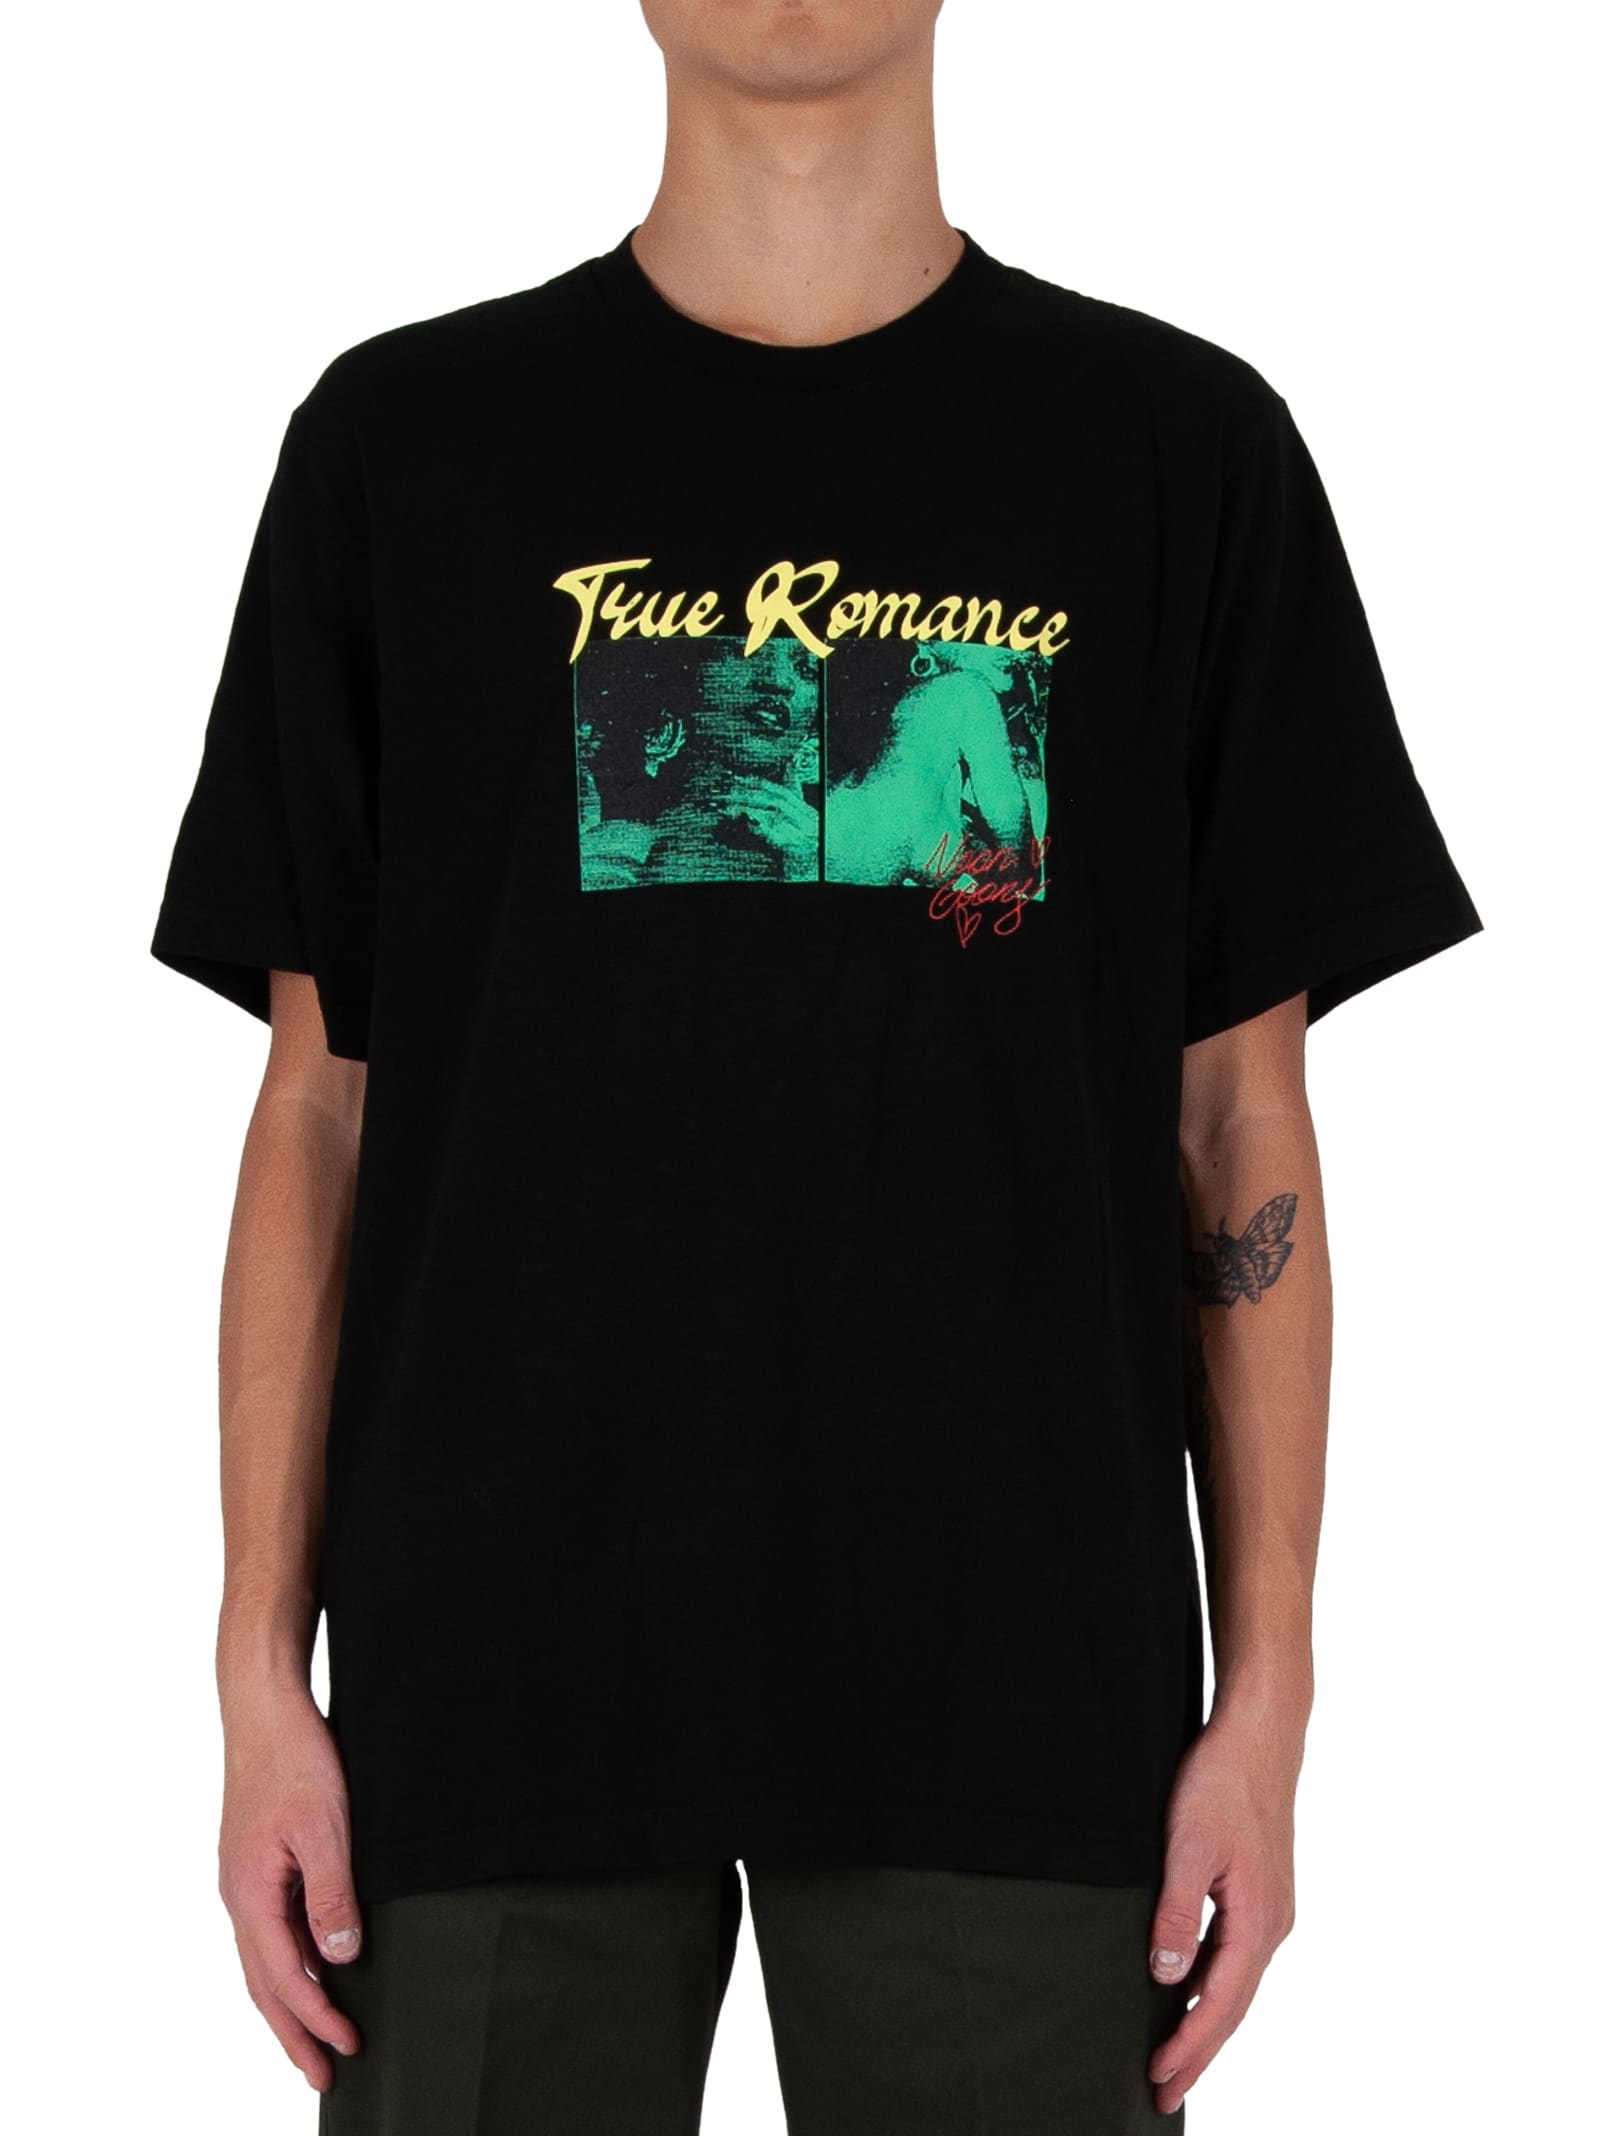 True Romance Tee - Black